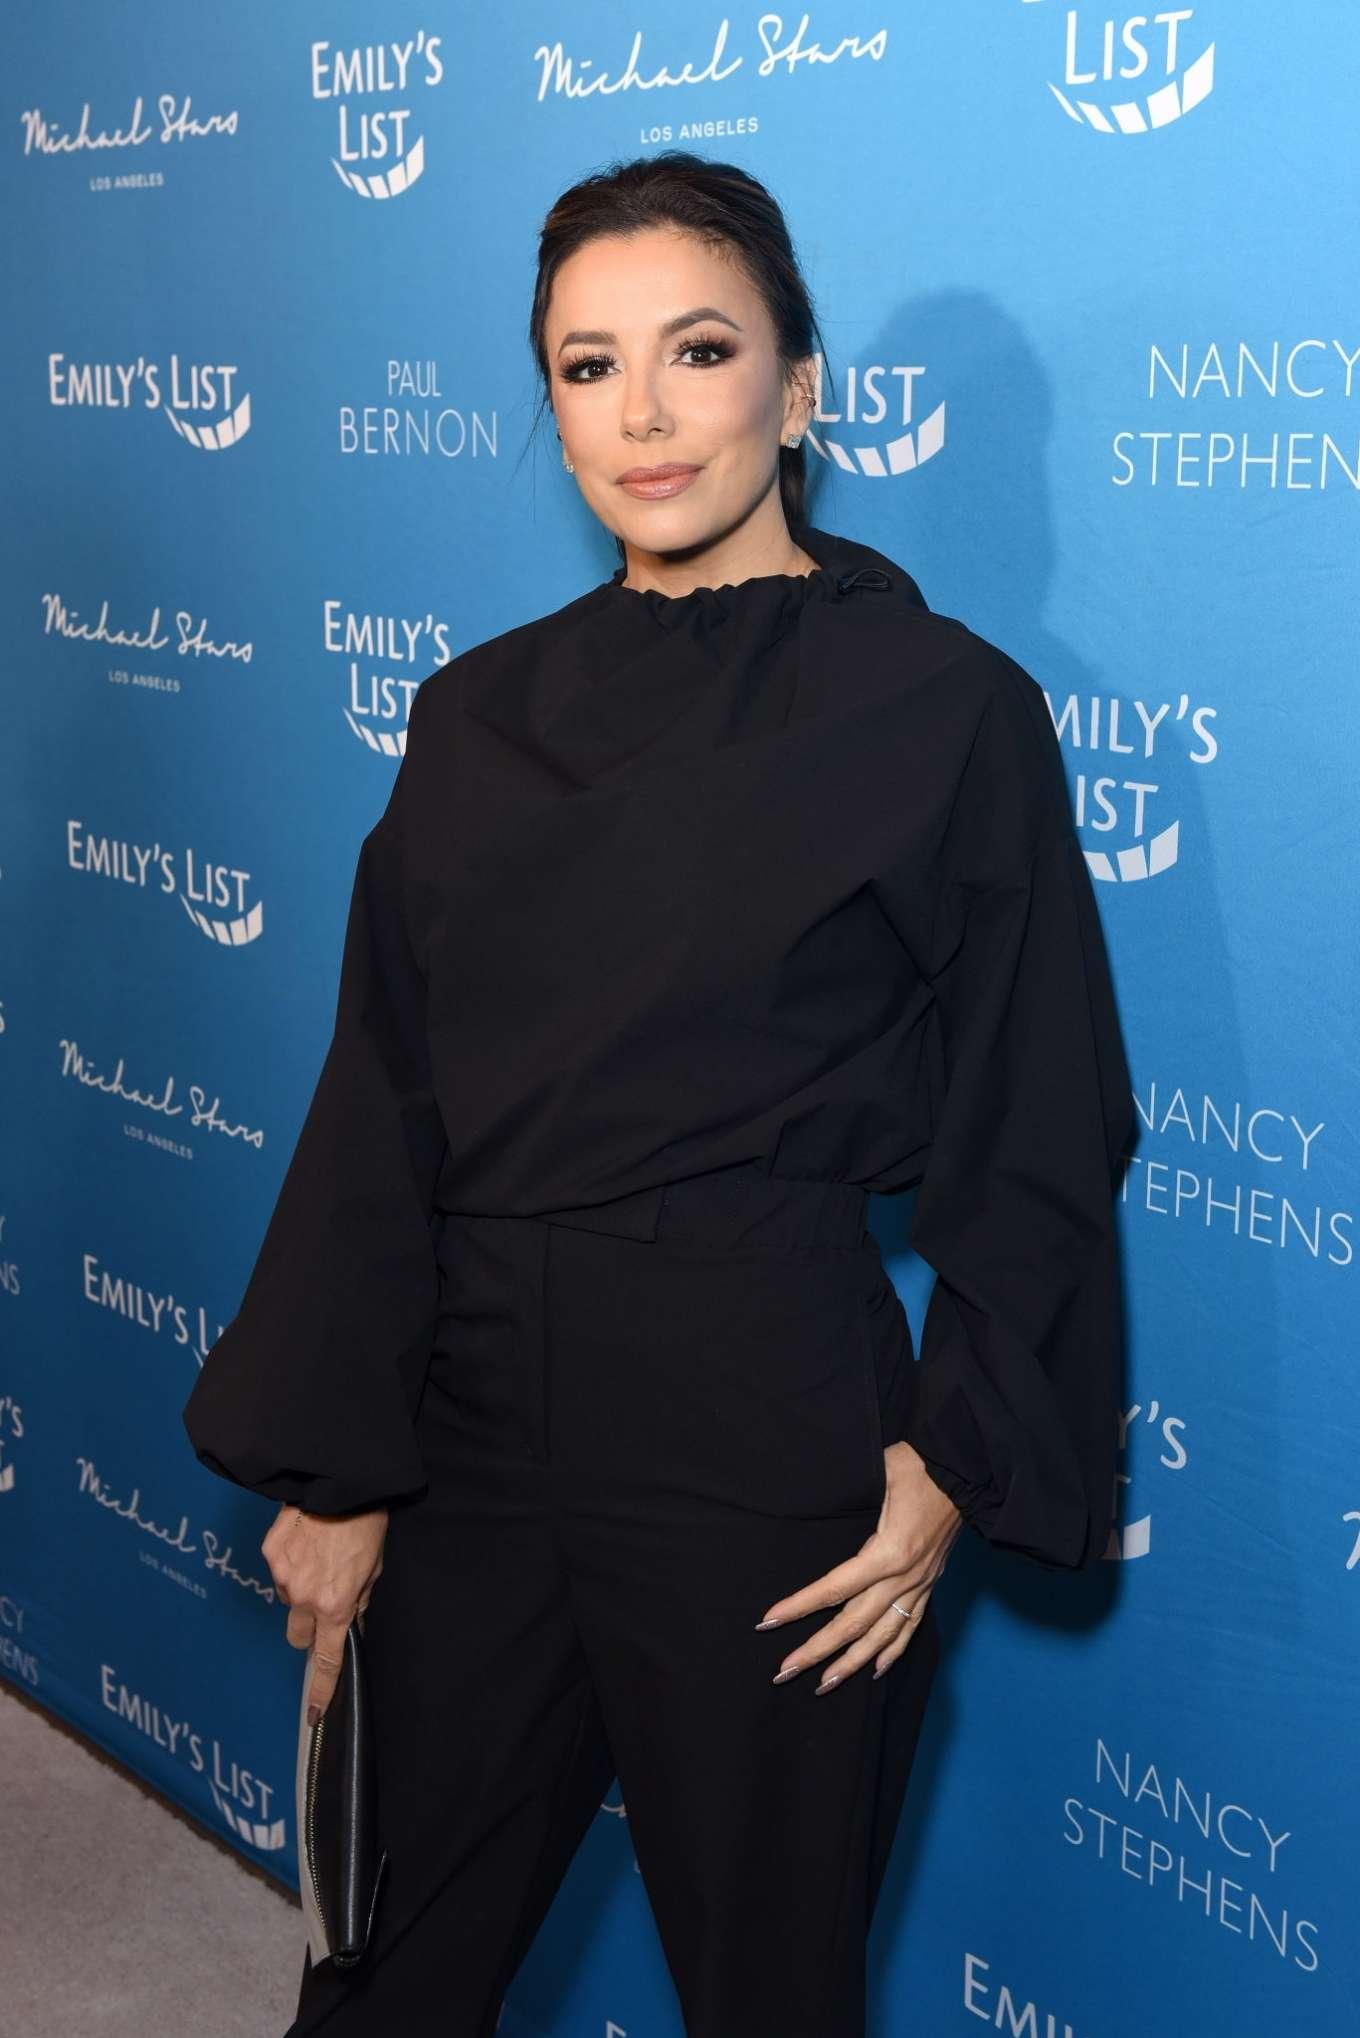 Eva Longoria - EMILY's List Brunch and Panel Discussion 'Defining Women' in LA